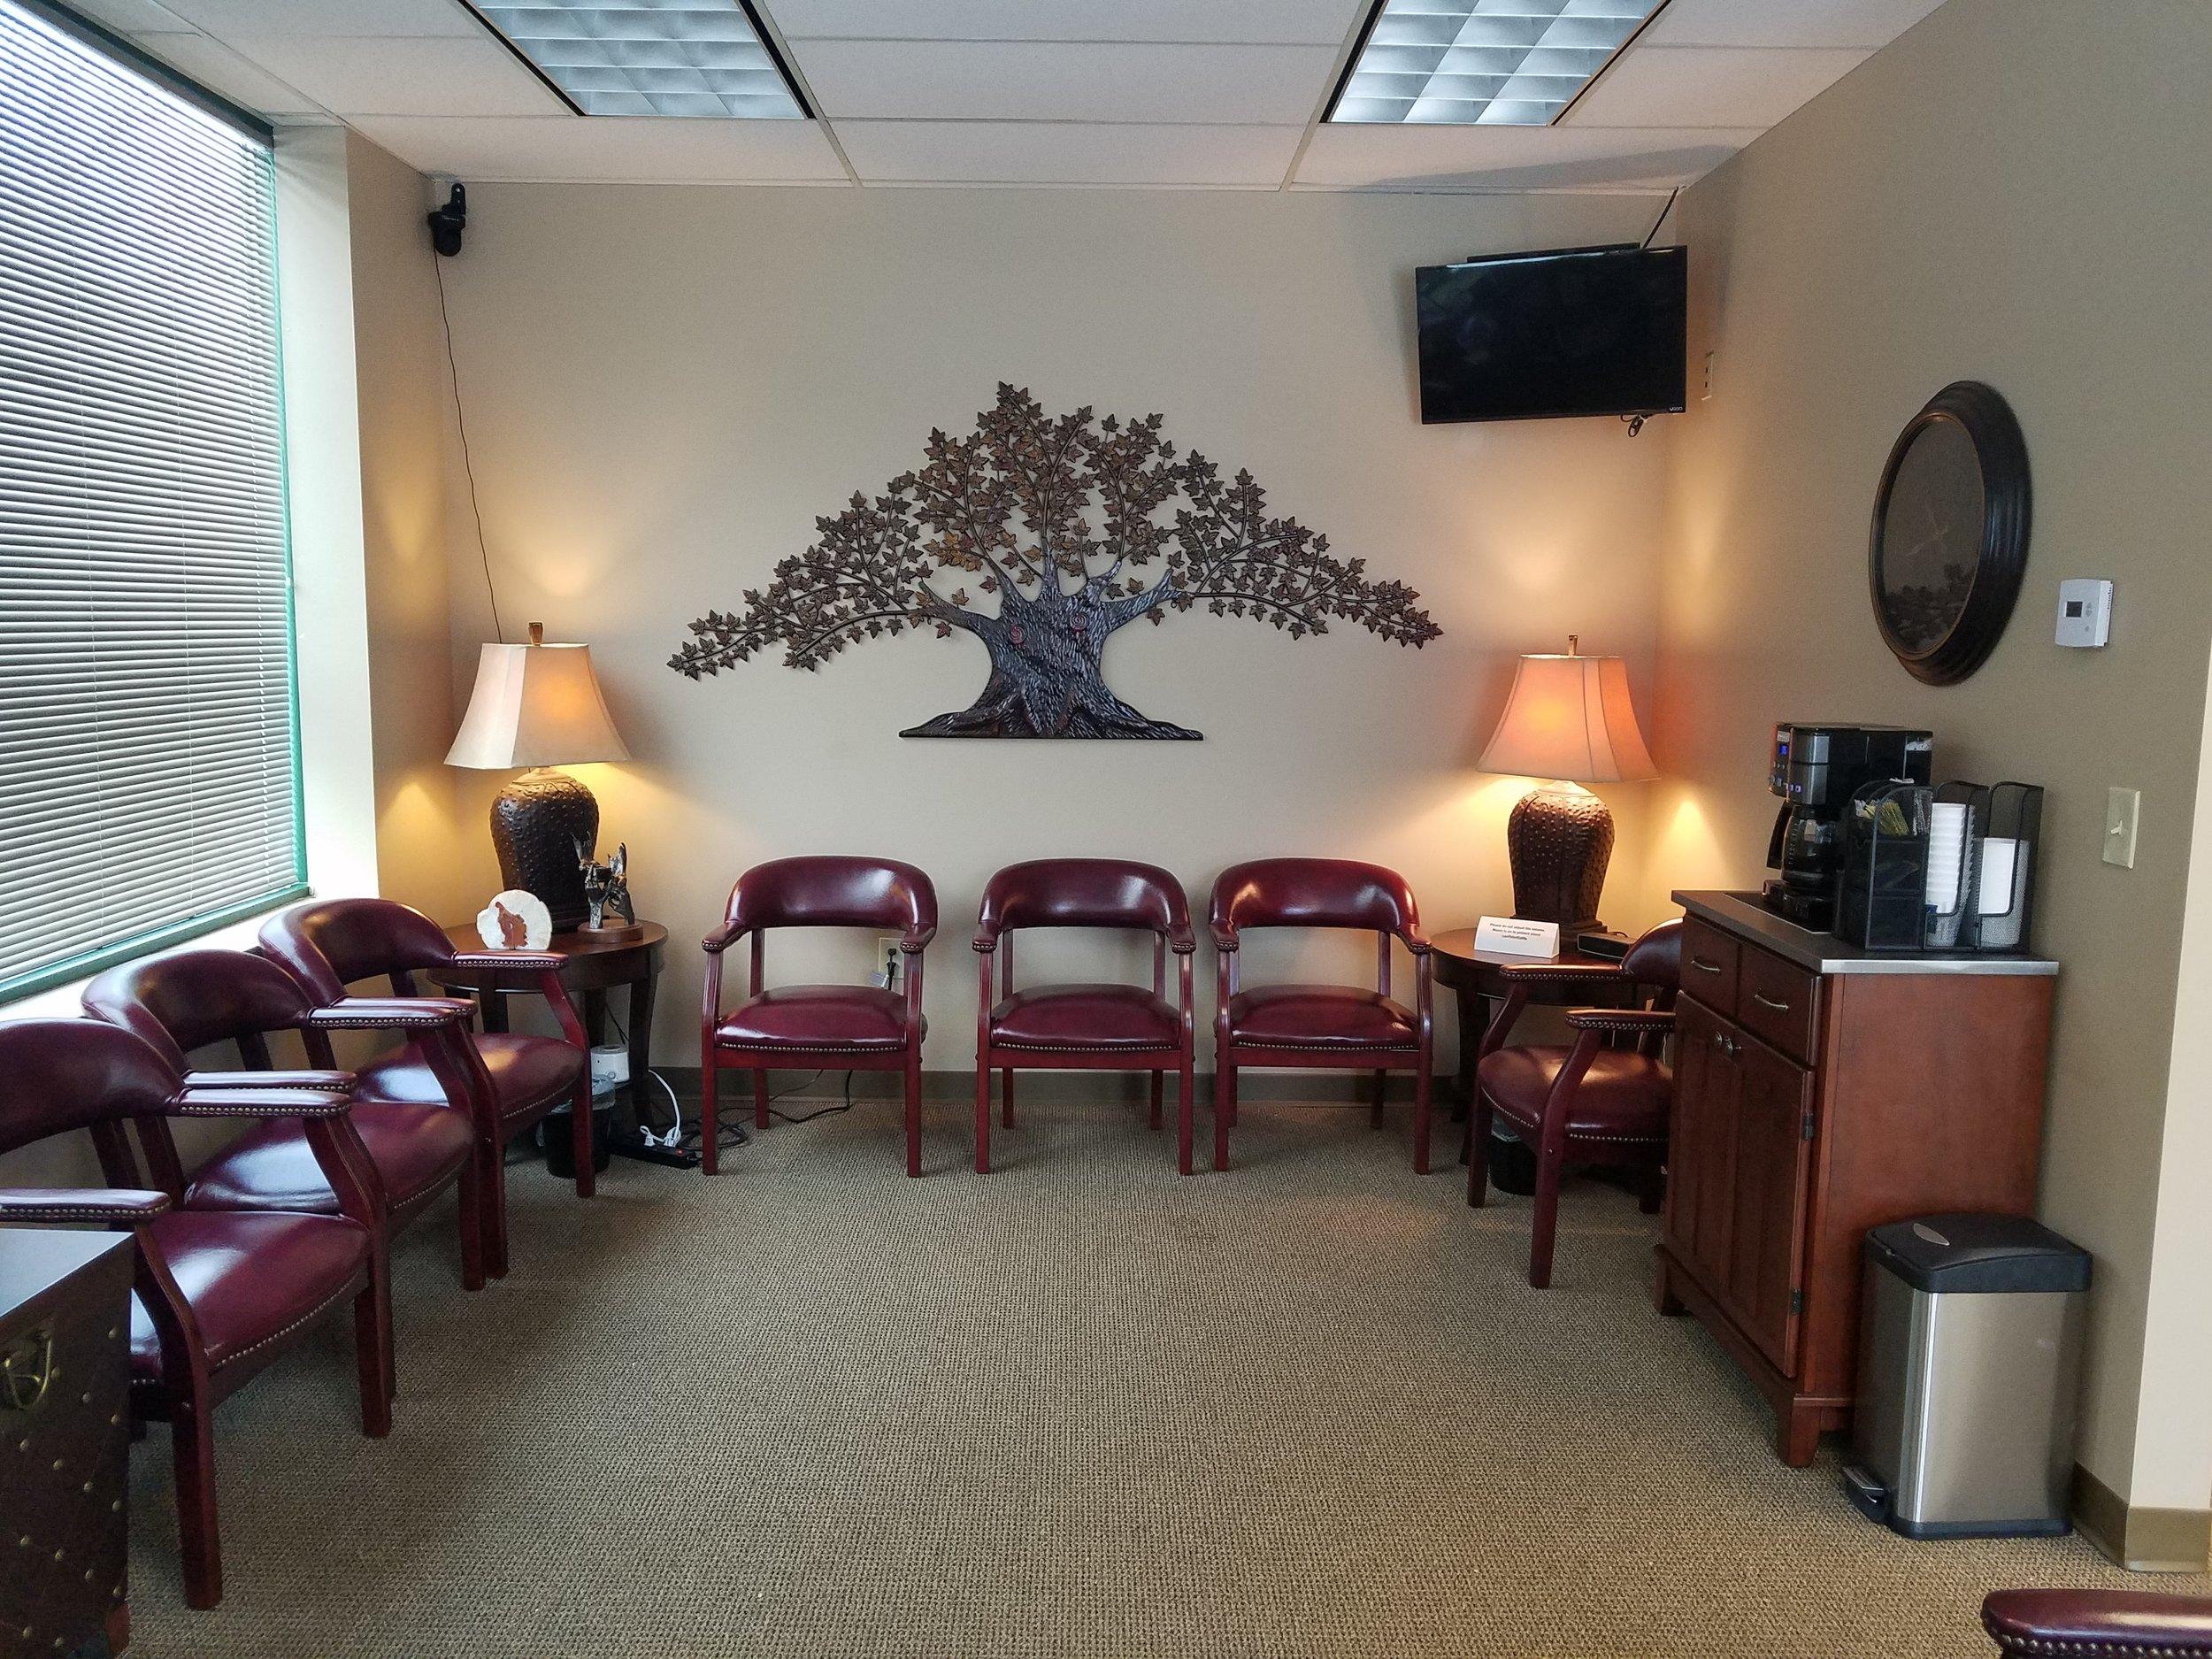 Counseling Alliance LLC - Waiting Room.jpeg